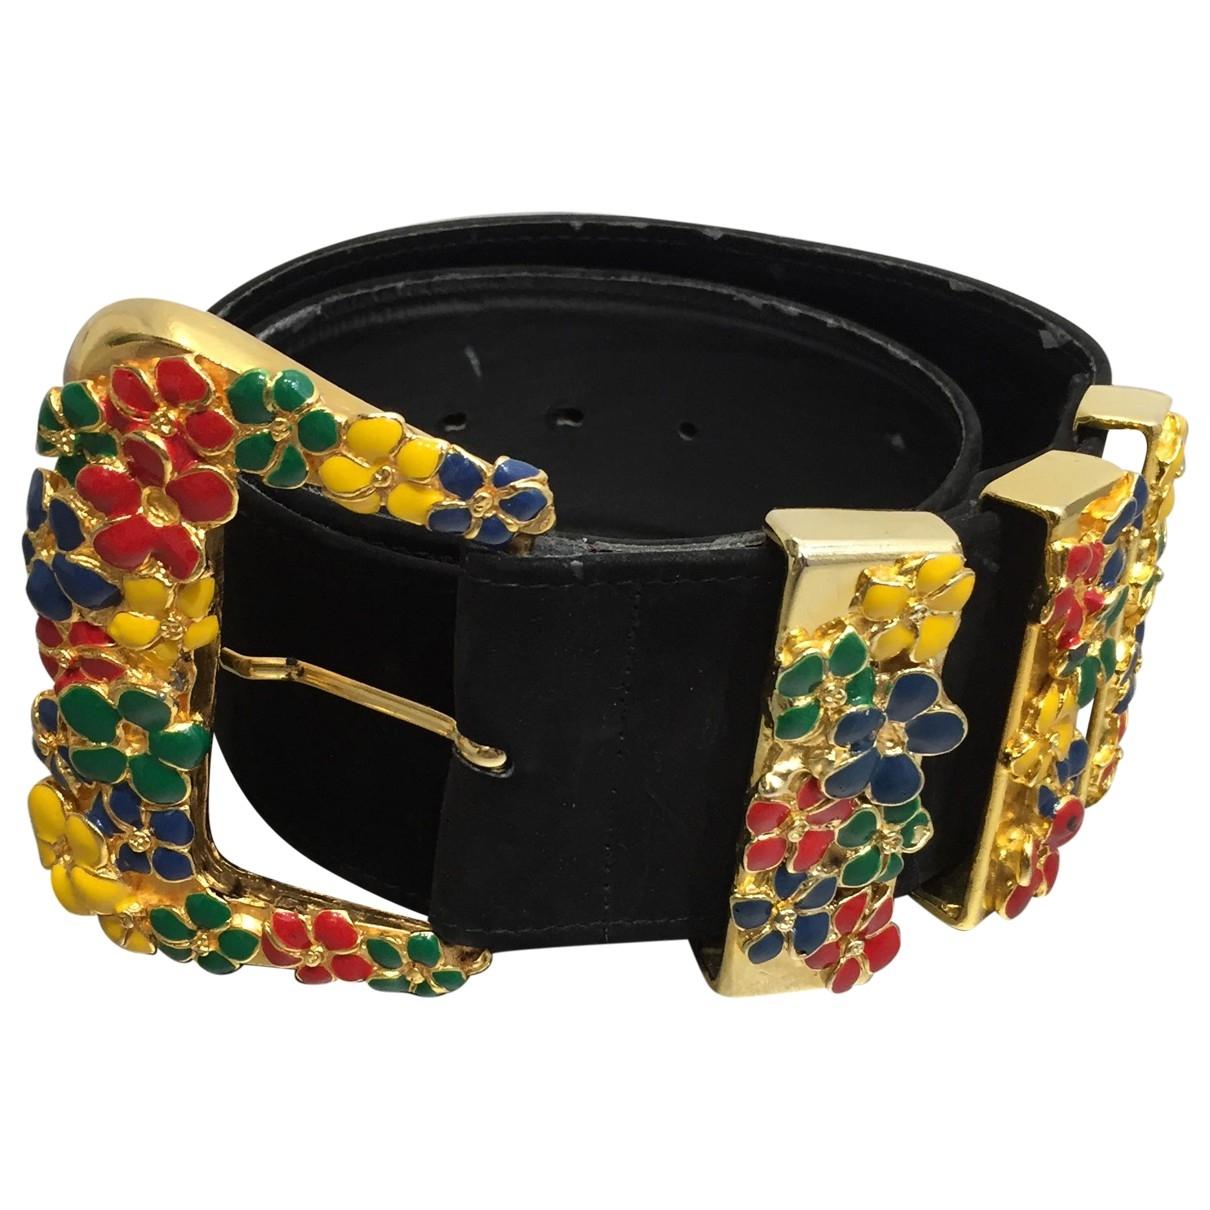 Cinturon Gianni Versace